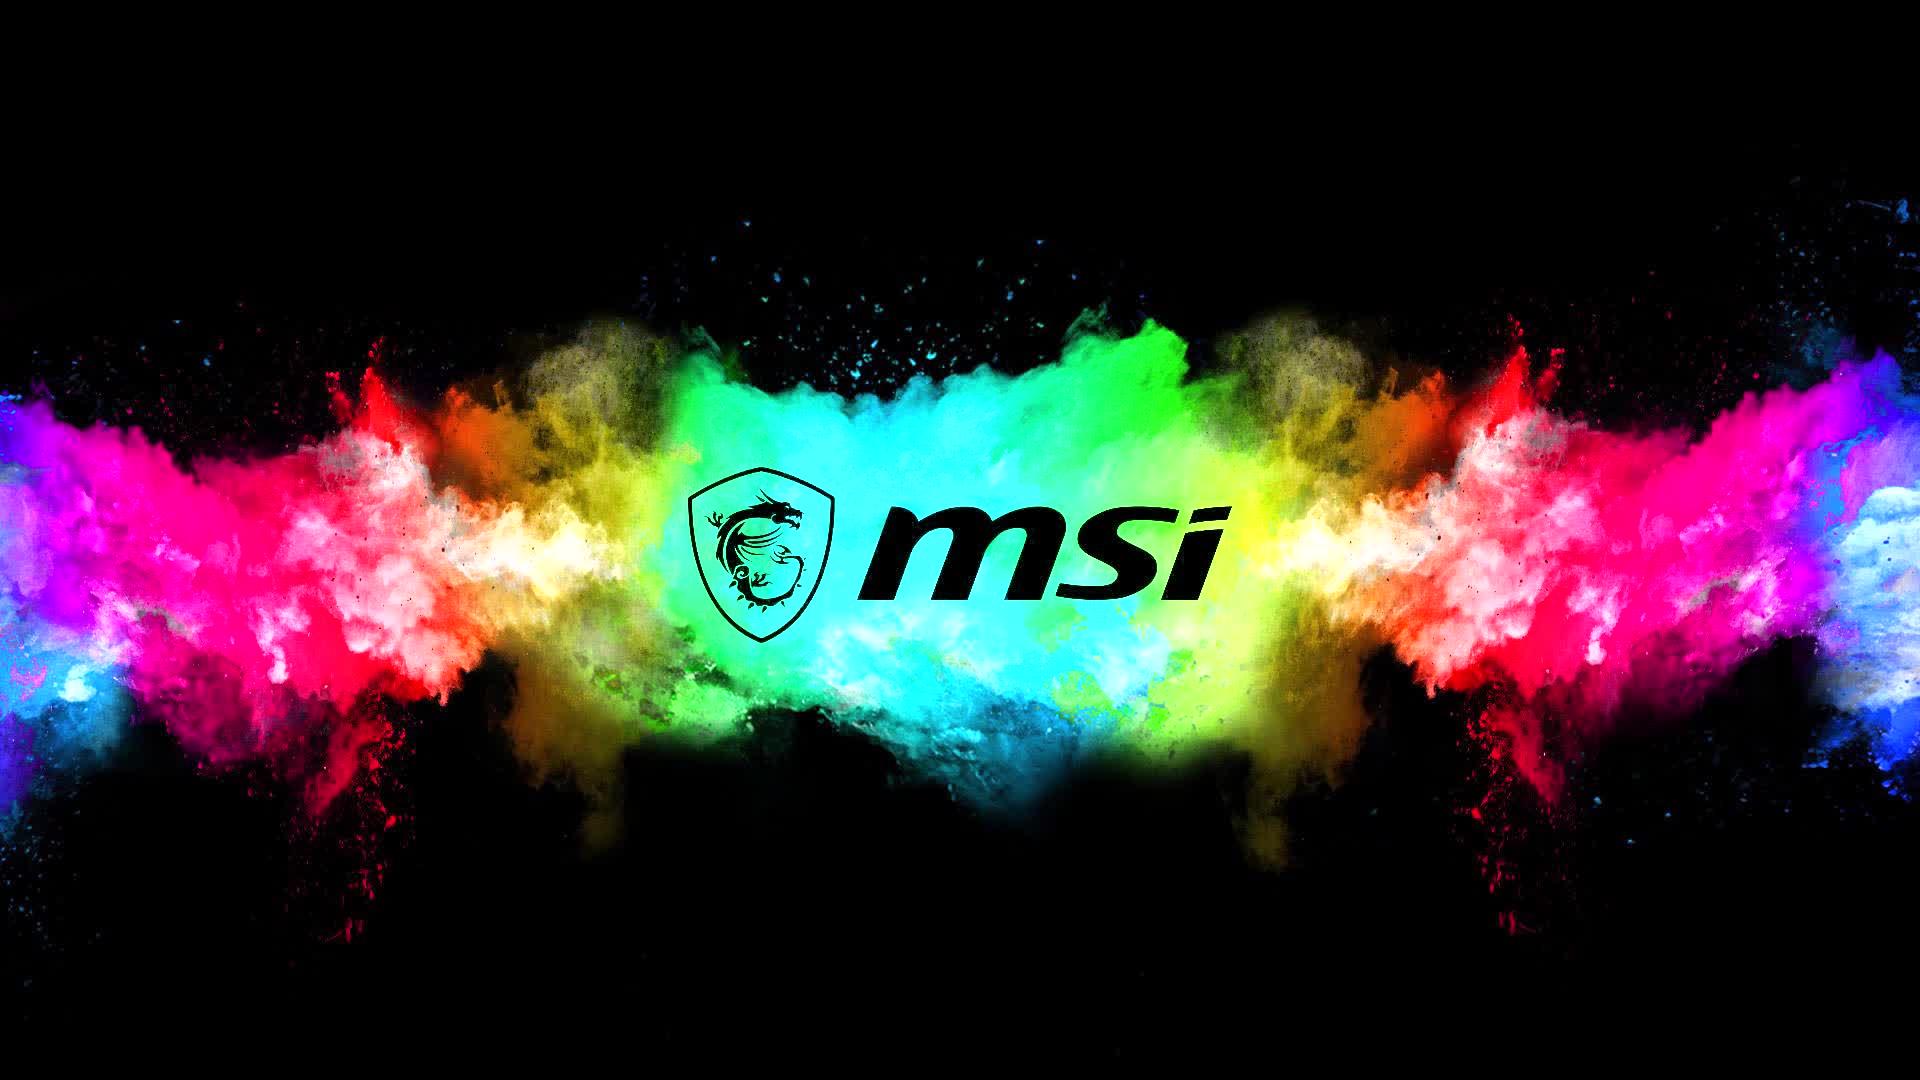 Msi Wallpaper 4k - HD Wallpaper